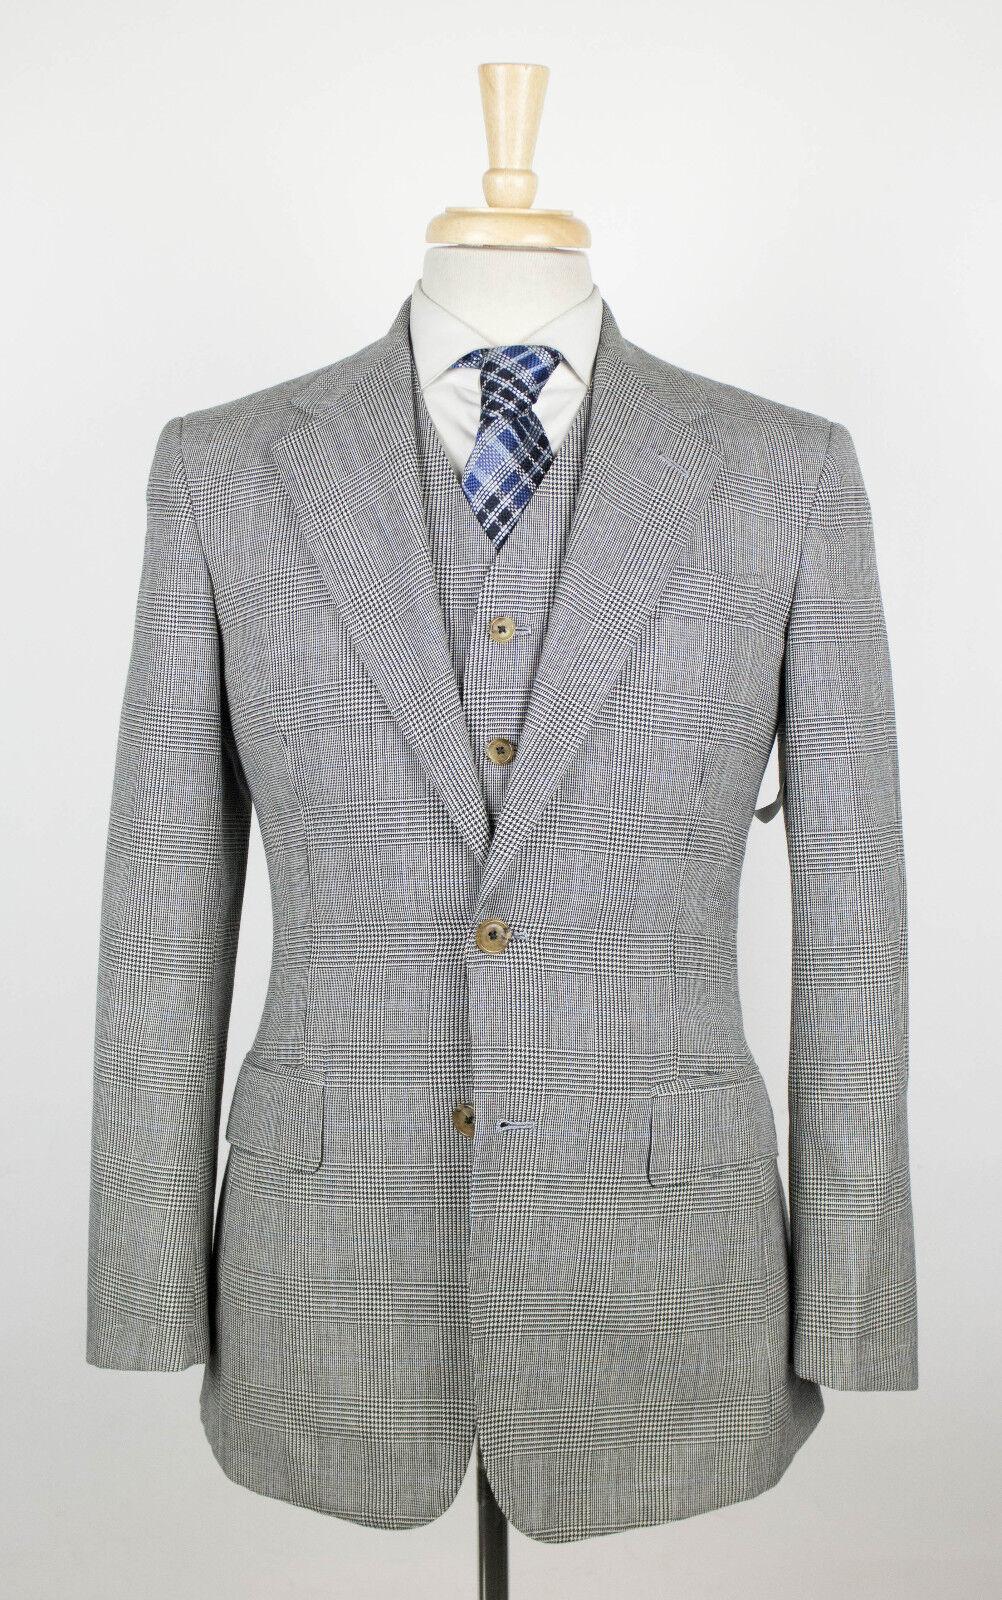 New FREEMANS SPORTING CLUB Martin Grünfield grau Plaid 3 Piece Suit 42 R 2440